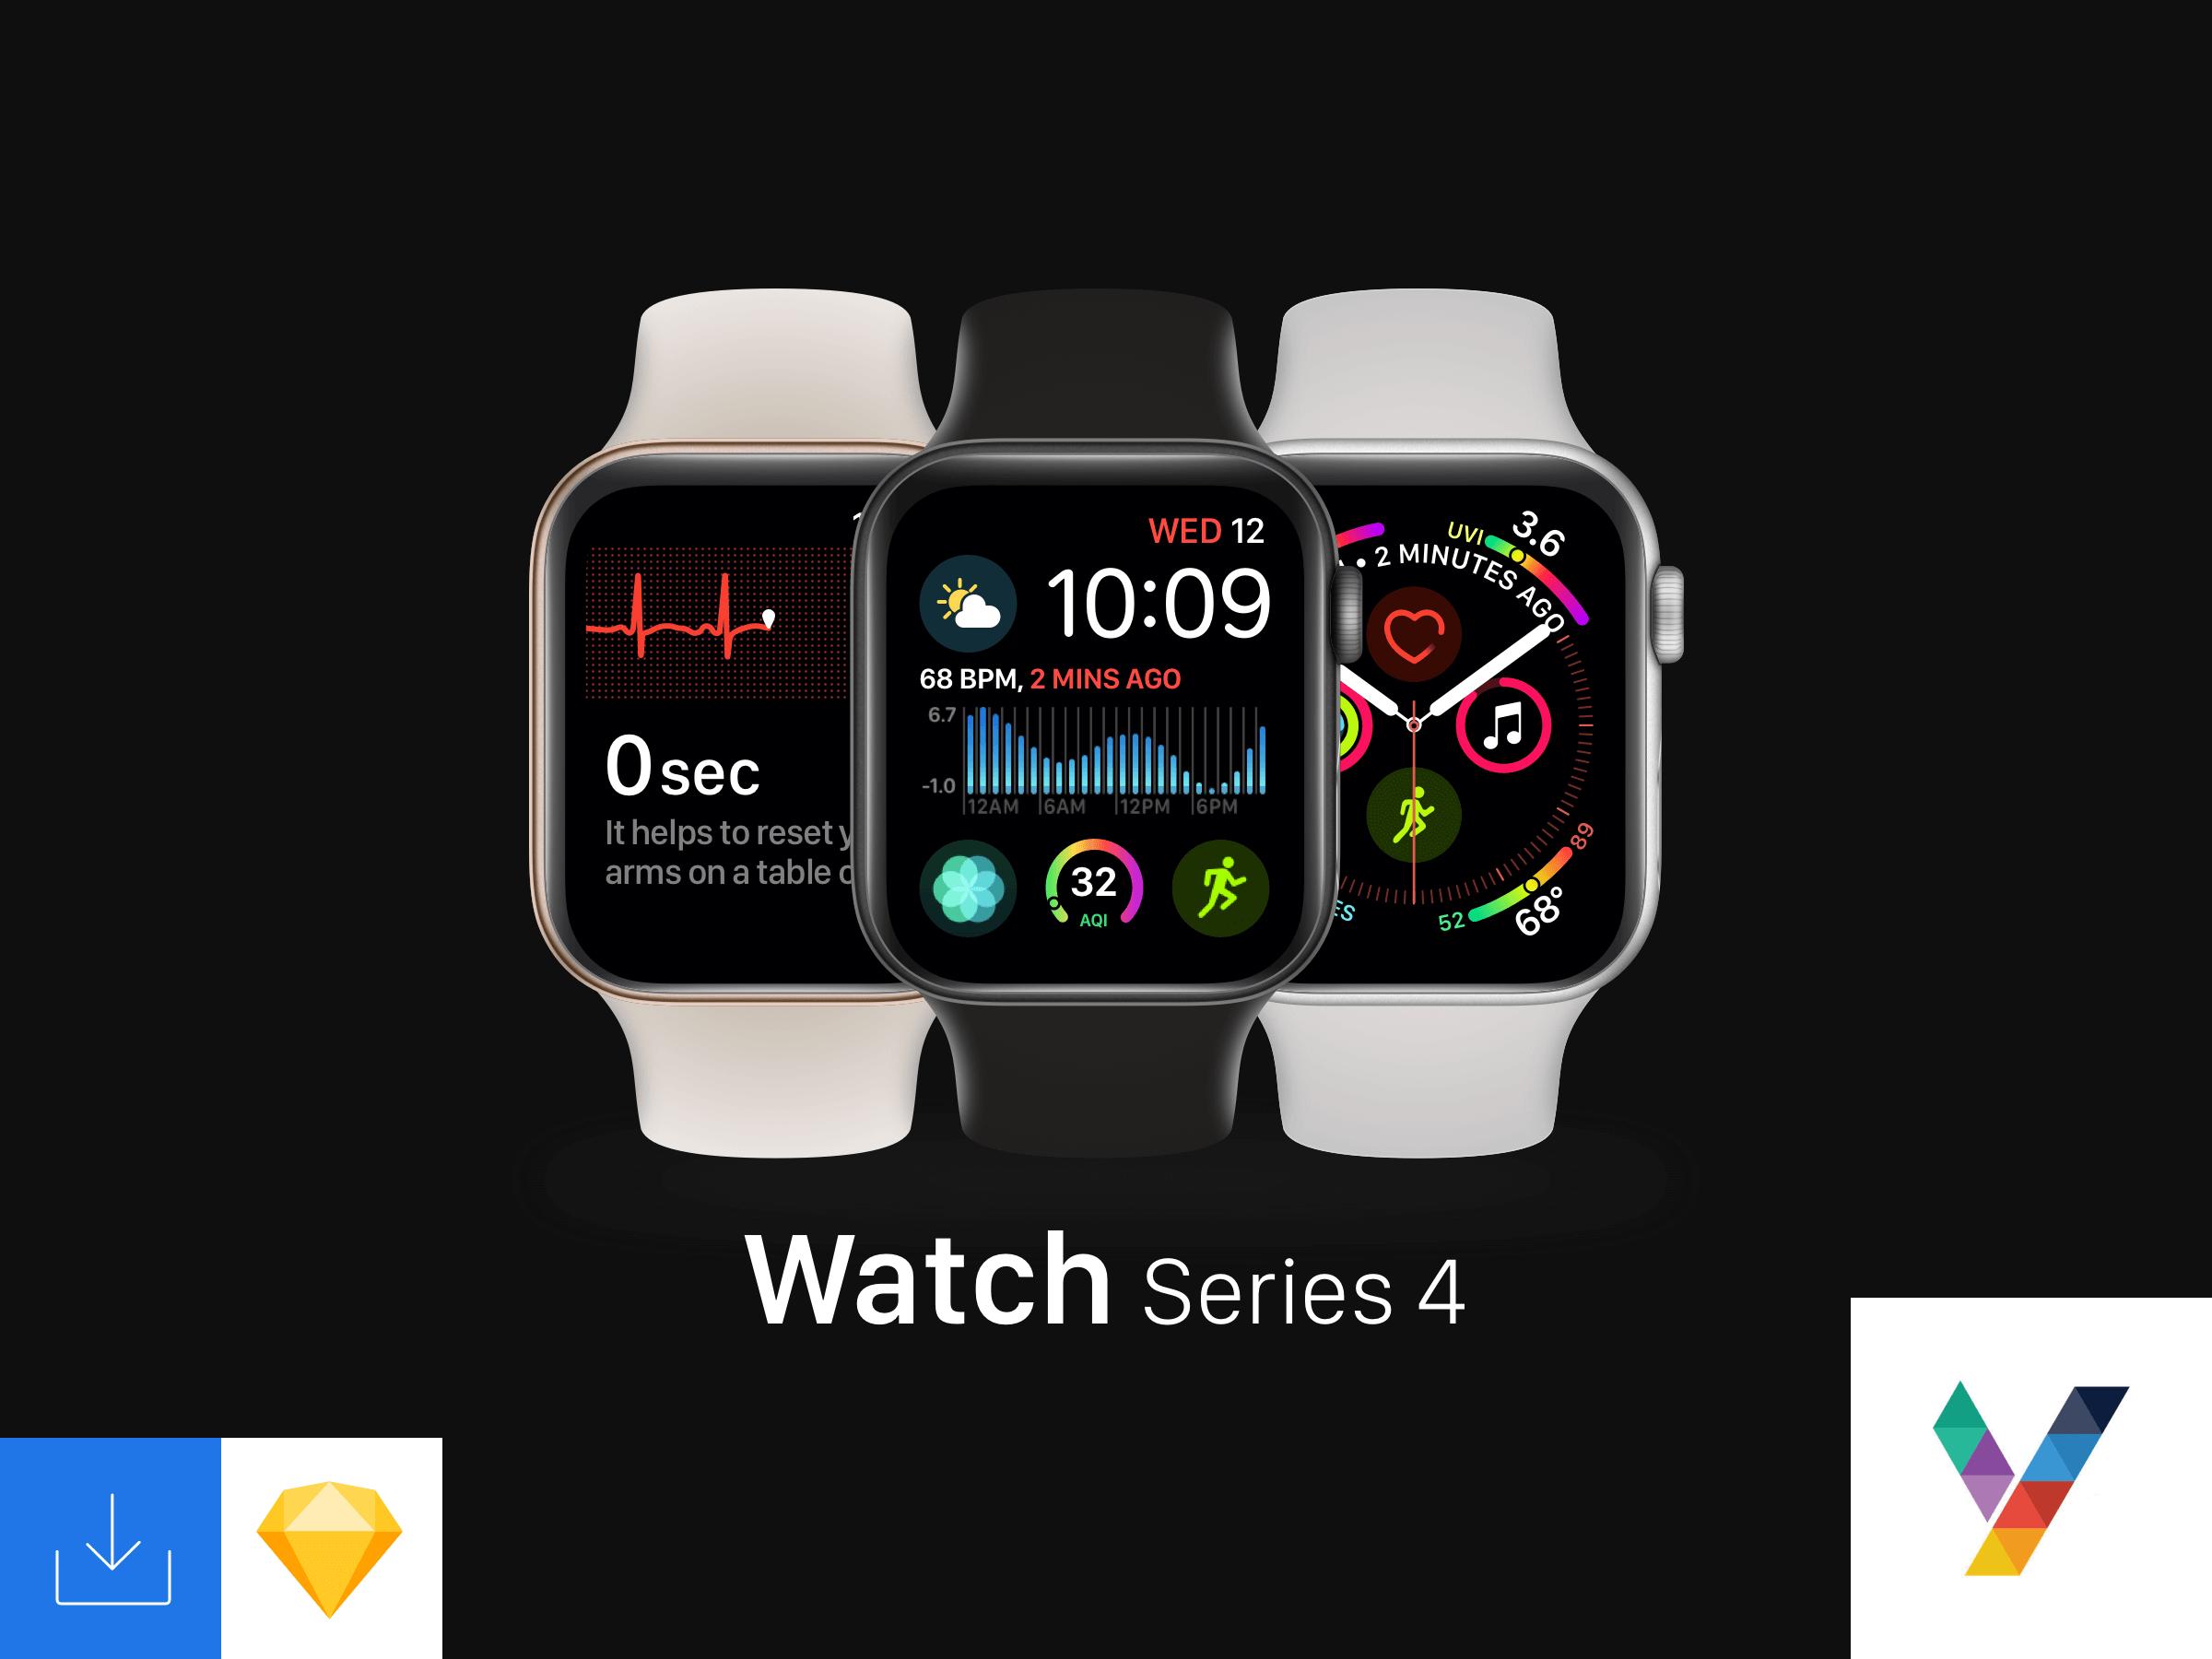 Watch Series 4 Mockup presentation image